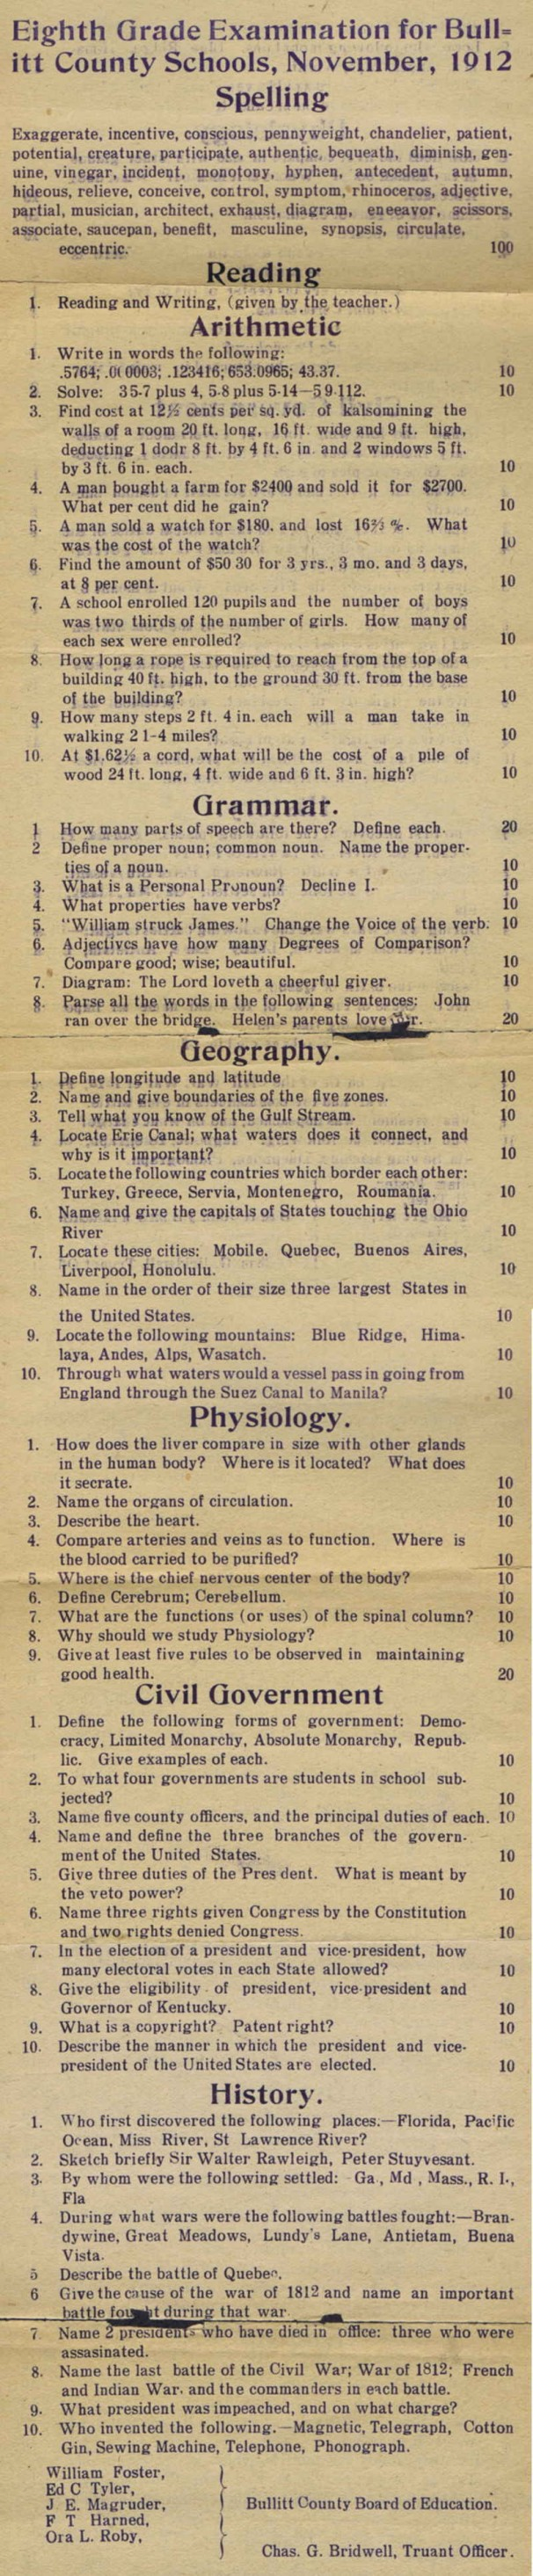 1912-schoolexam1912sm